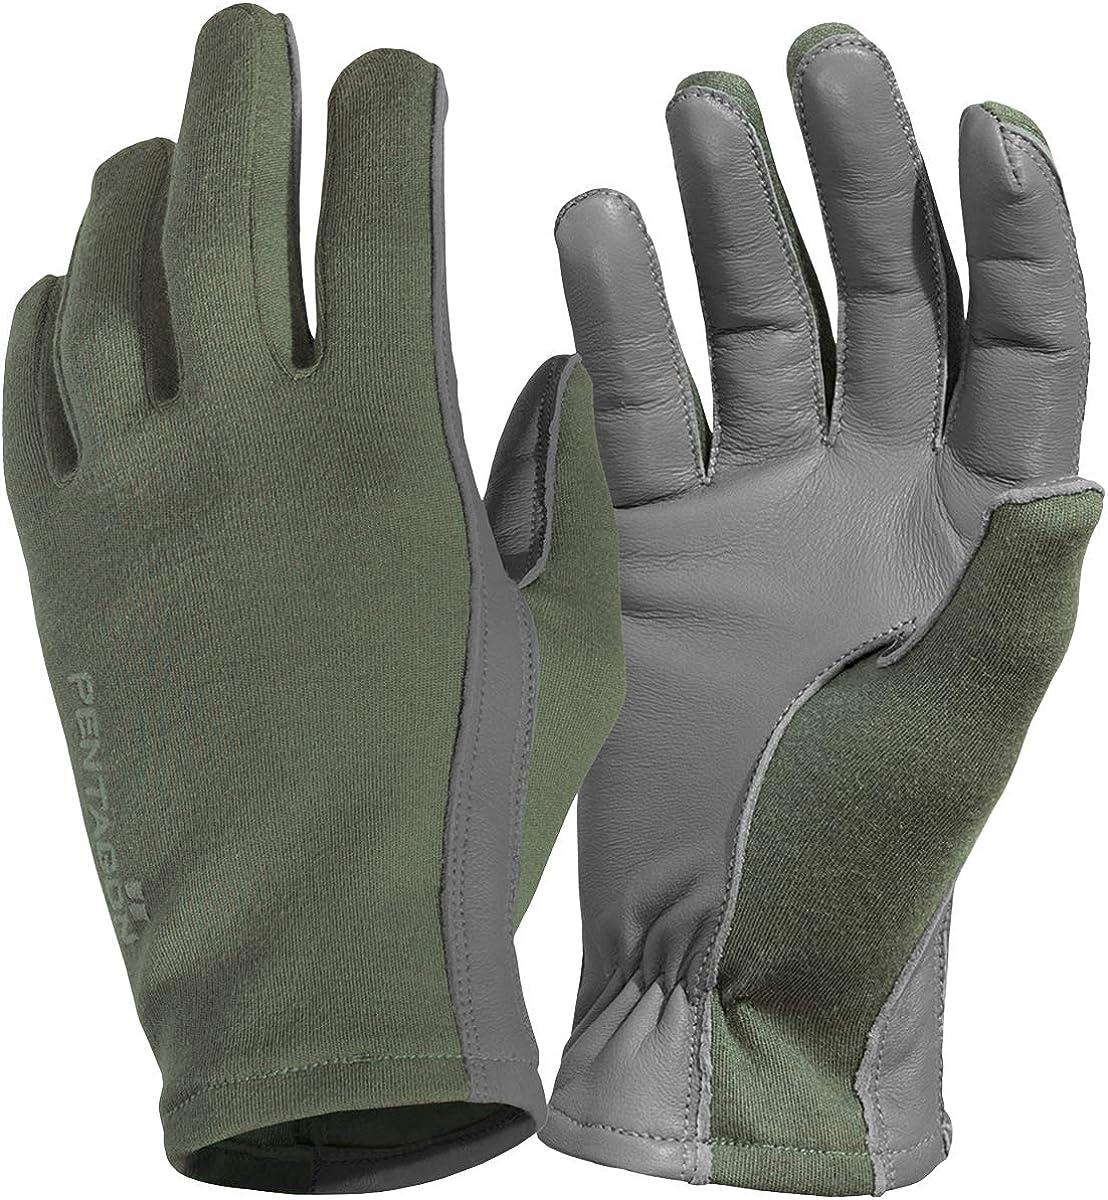 Pentagon Men's Super popular specialty New mail order store Short Cuff Olive Gloves Pilot